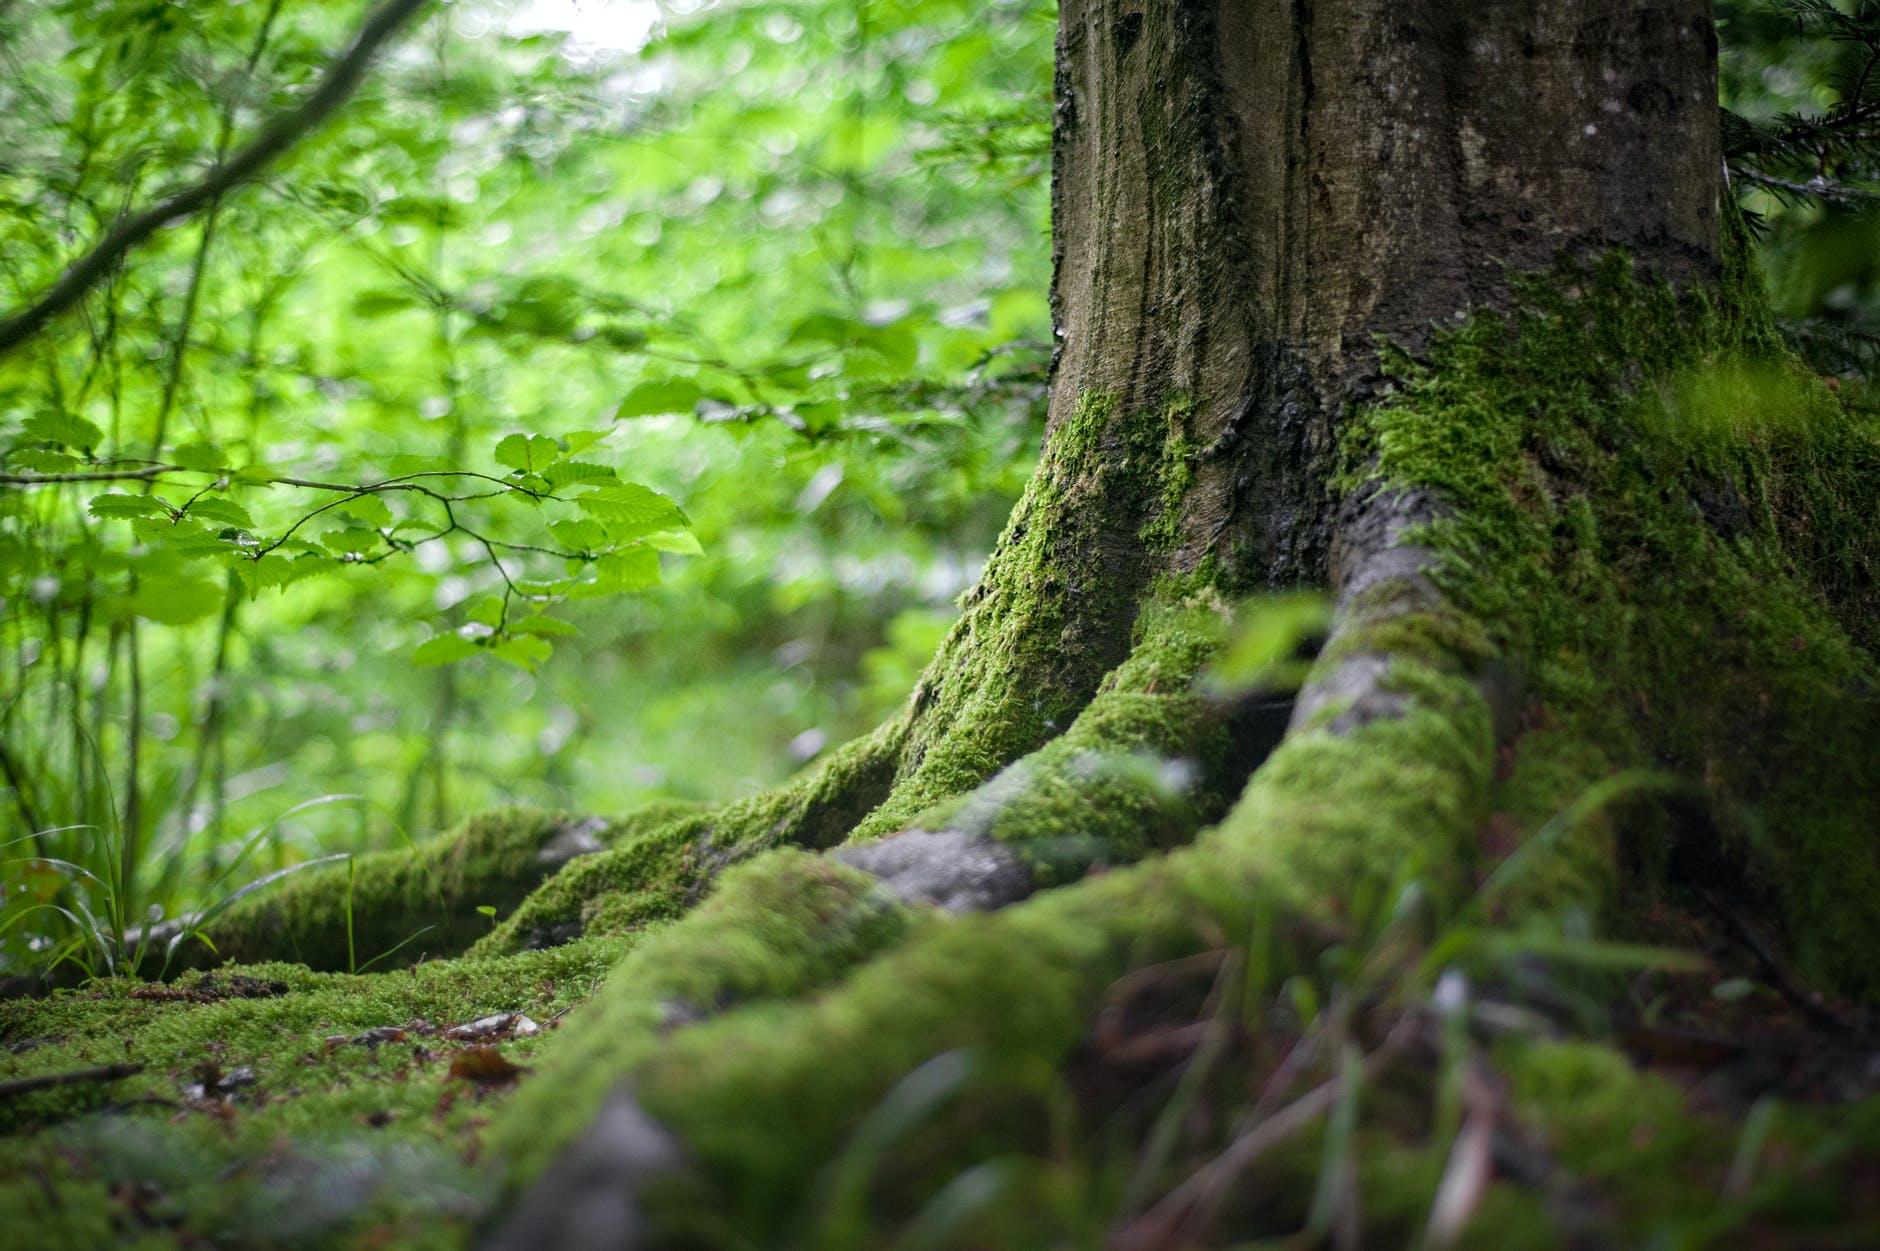 Base de tronco en la selva